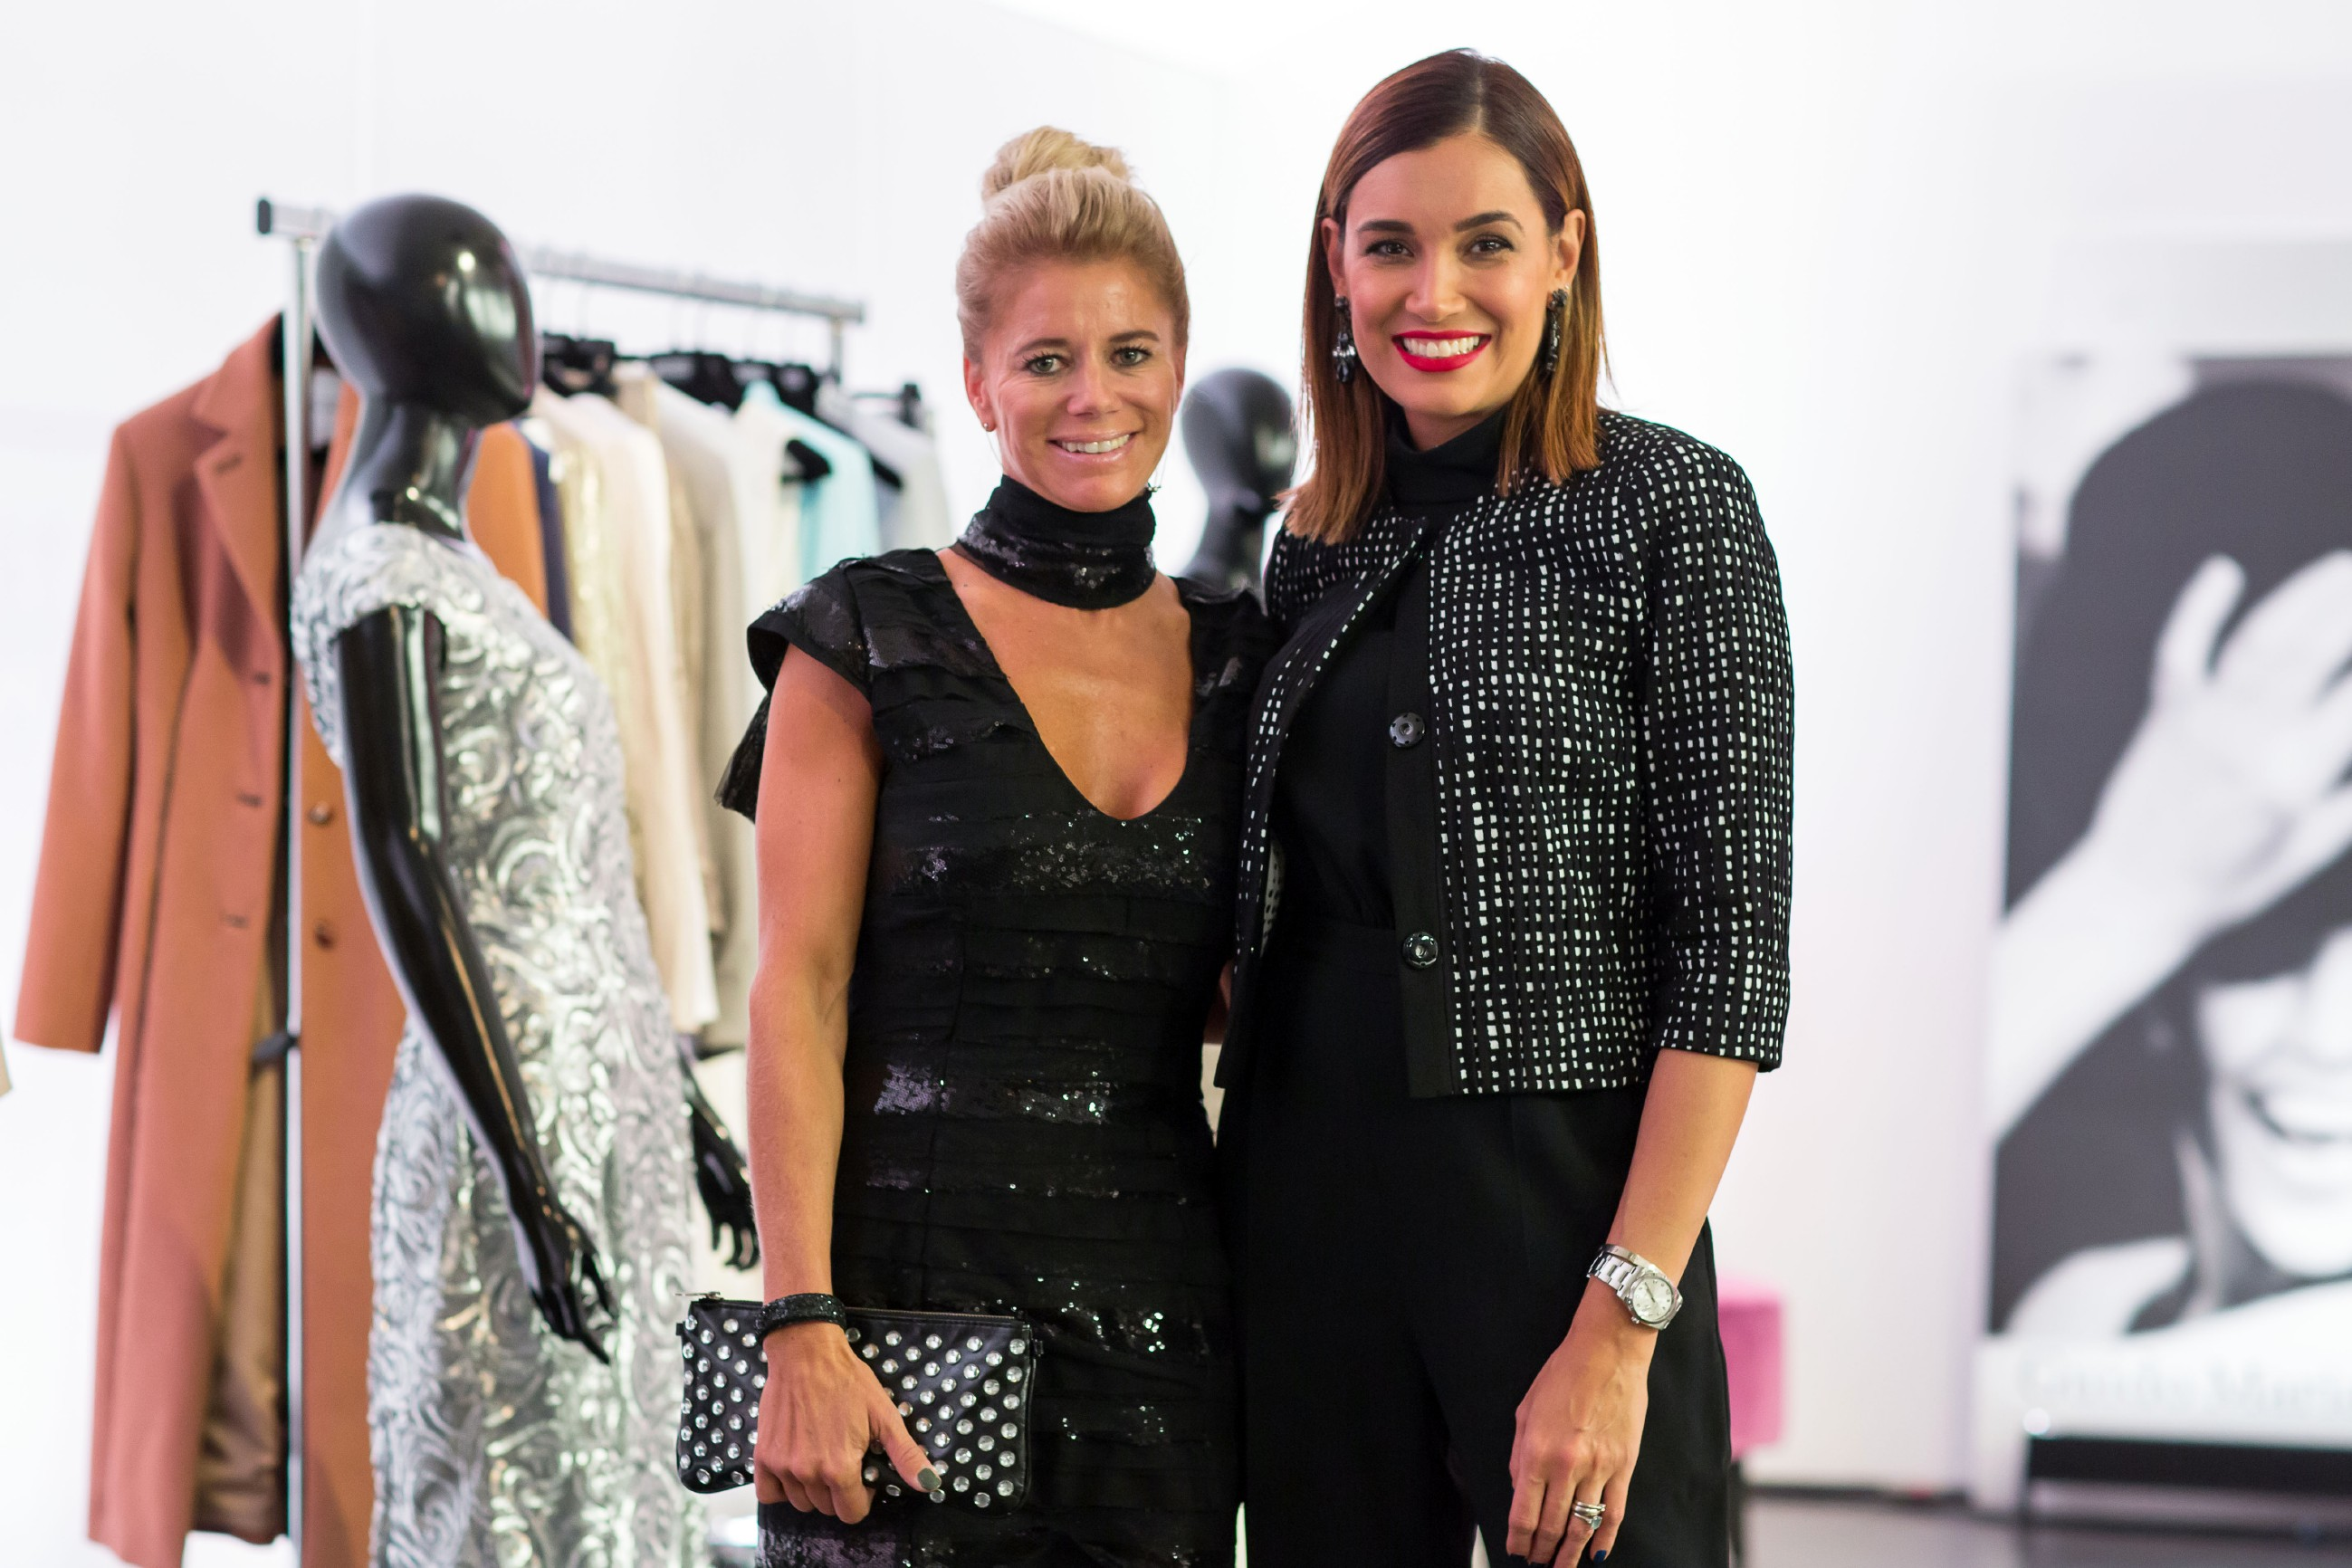 Guidos Shopping Queen des Jahres 2015 - Tina Klaus mit Jana Ina Zarrella